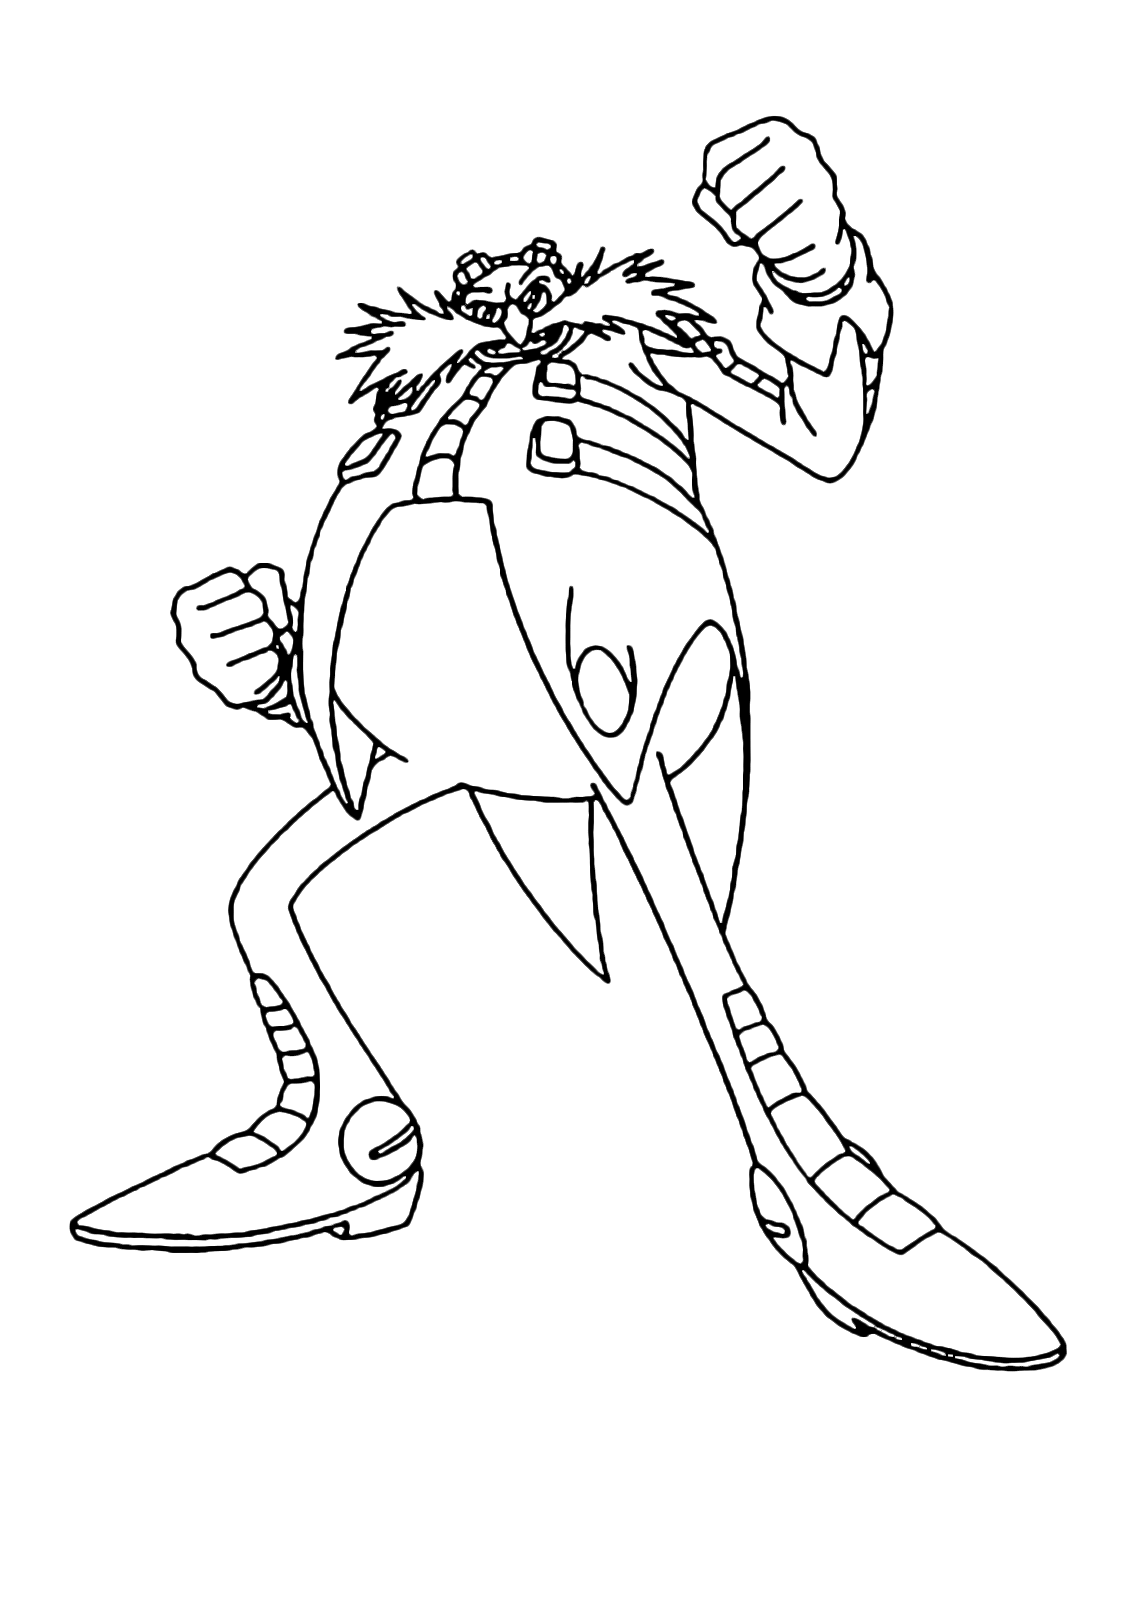 Sonic Boom - Dr. Eggman is the genius of evil